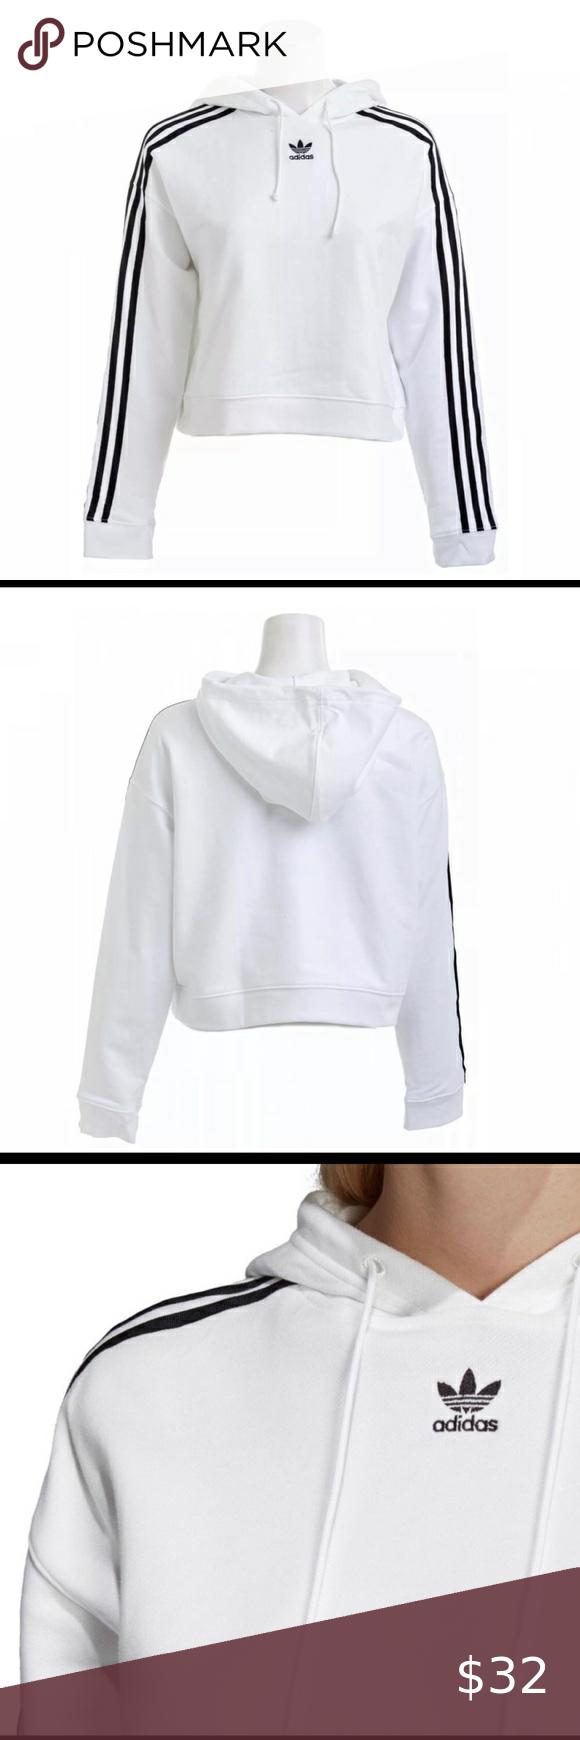 Predownload: Nwt Adidas Originals Cropped Hoodie Sz M Crop Sweatshirt Hoodie Cropped Hoodie Sweatshirts Hoodie [ 1740 x 580 Pixel ]